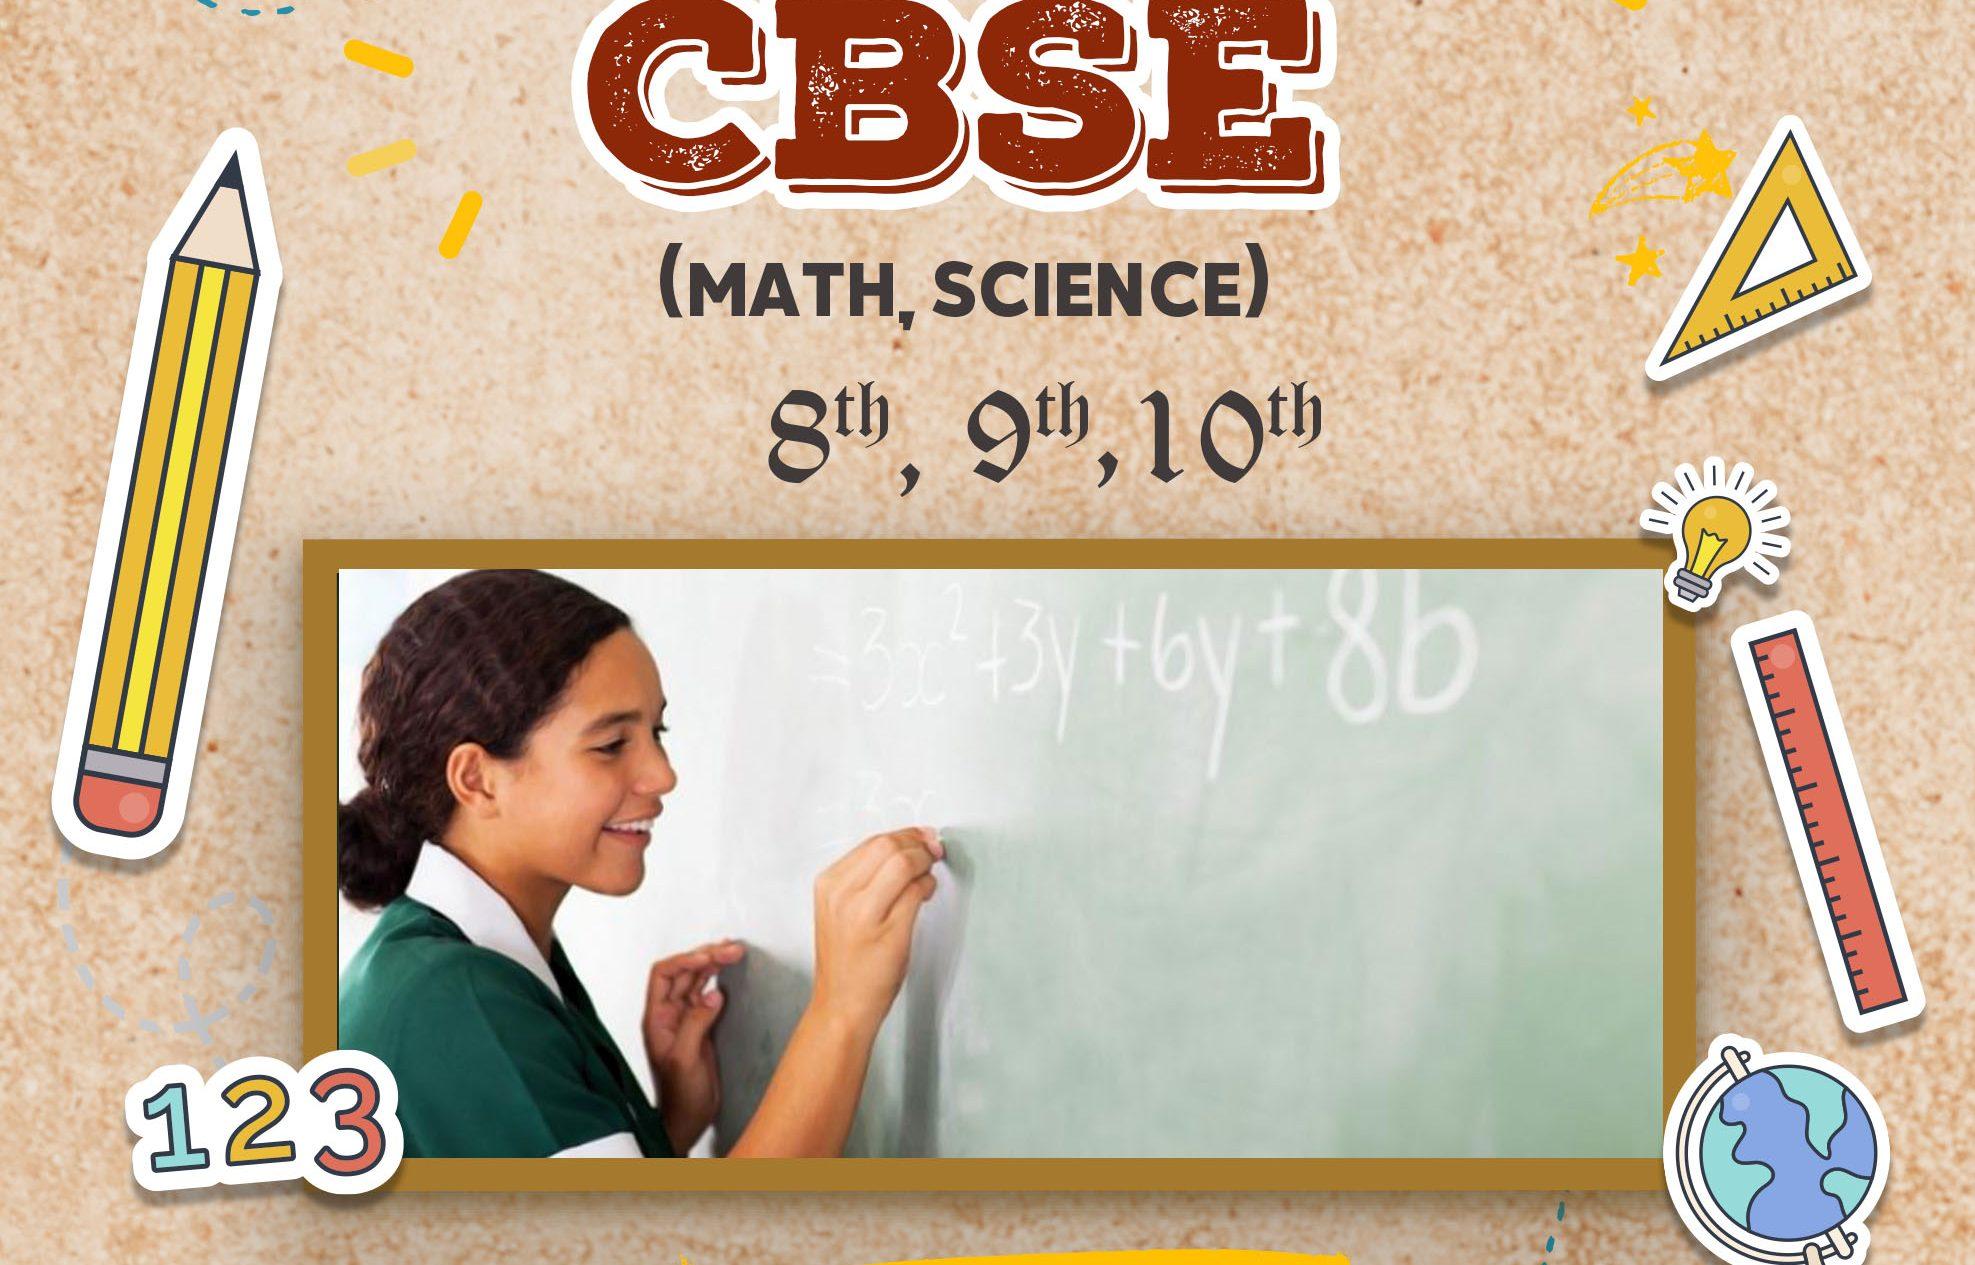 CBSE online classes